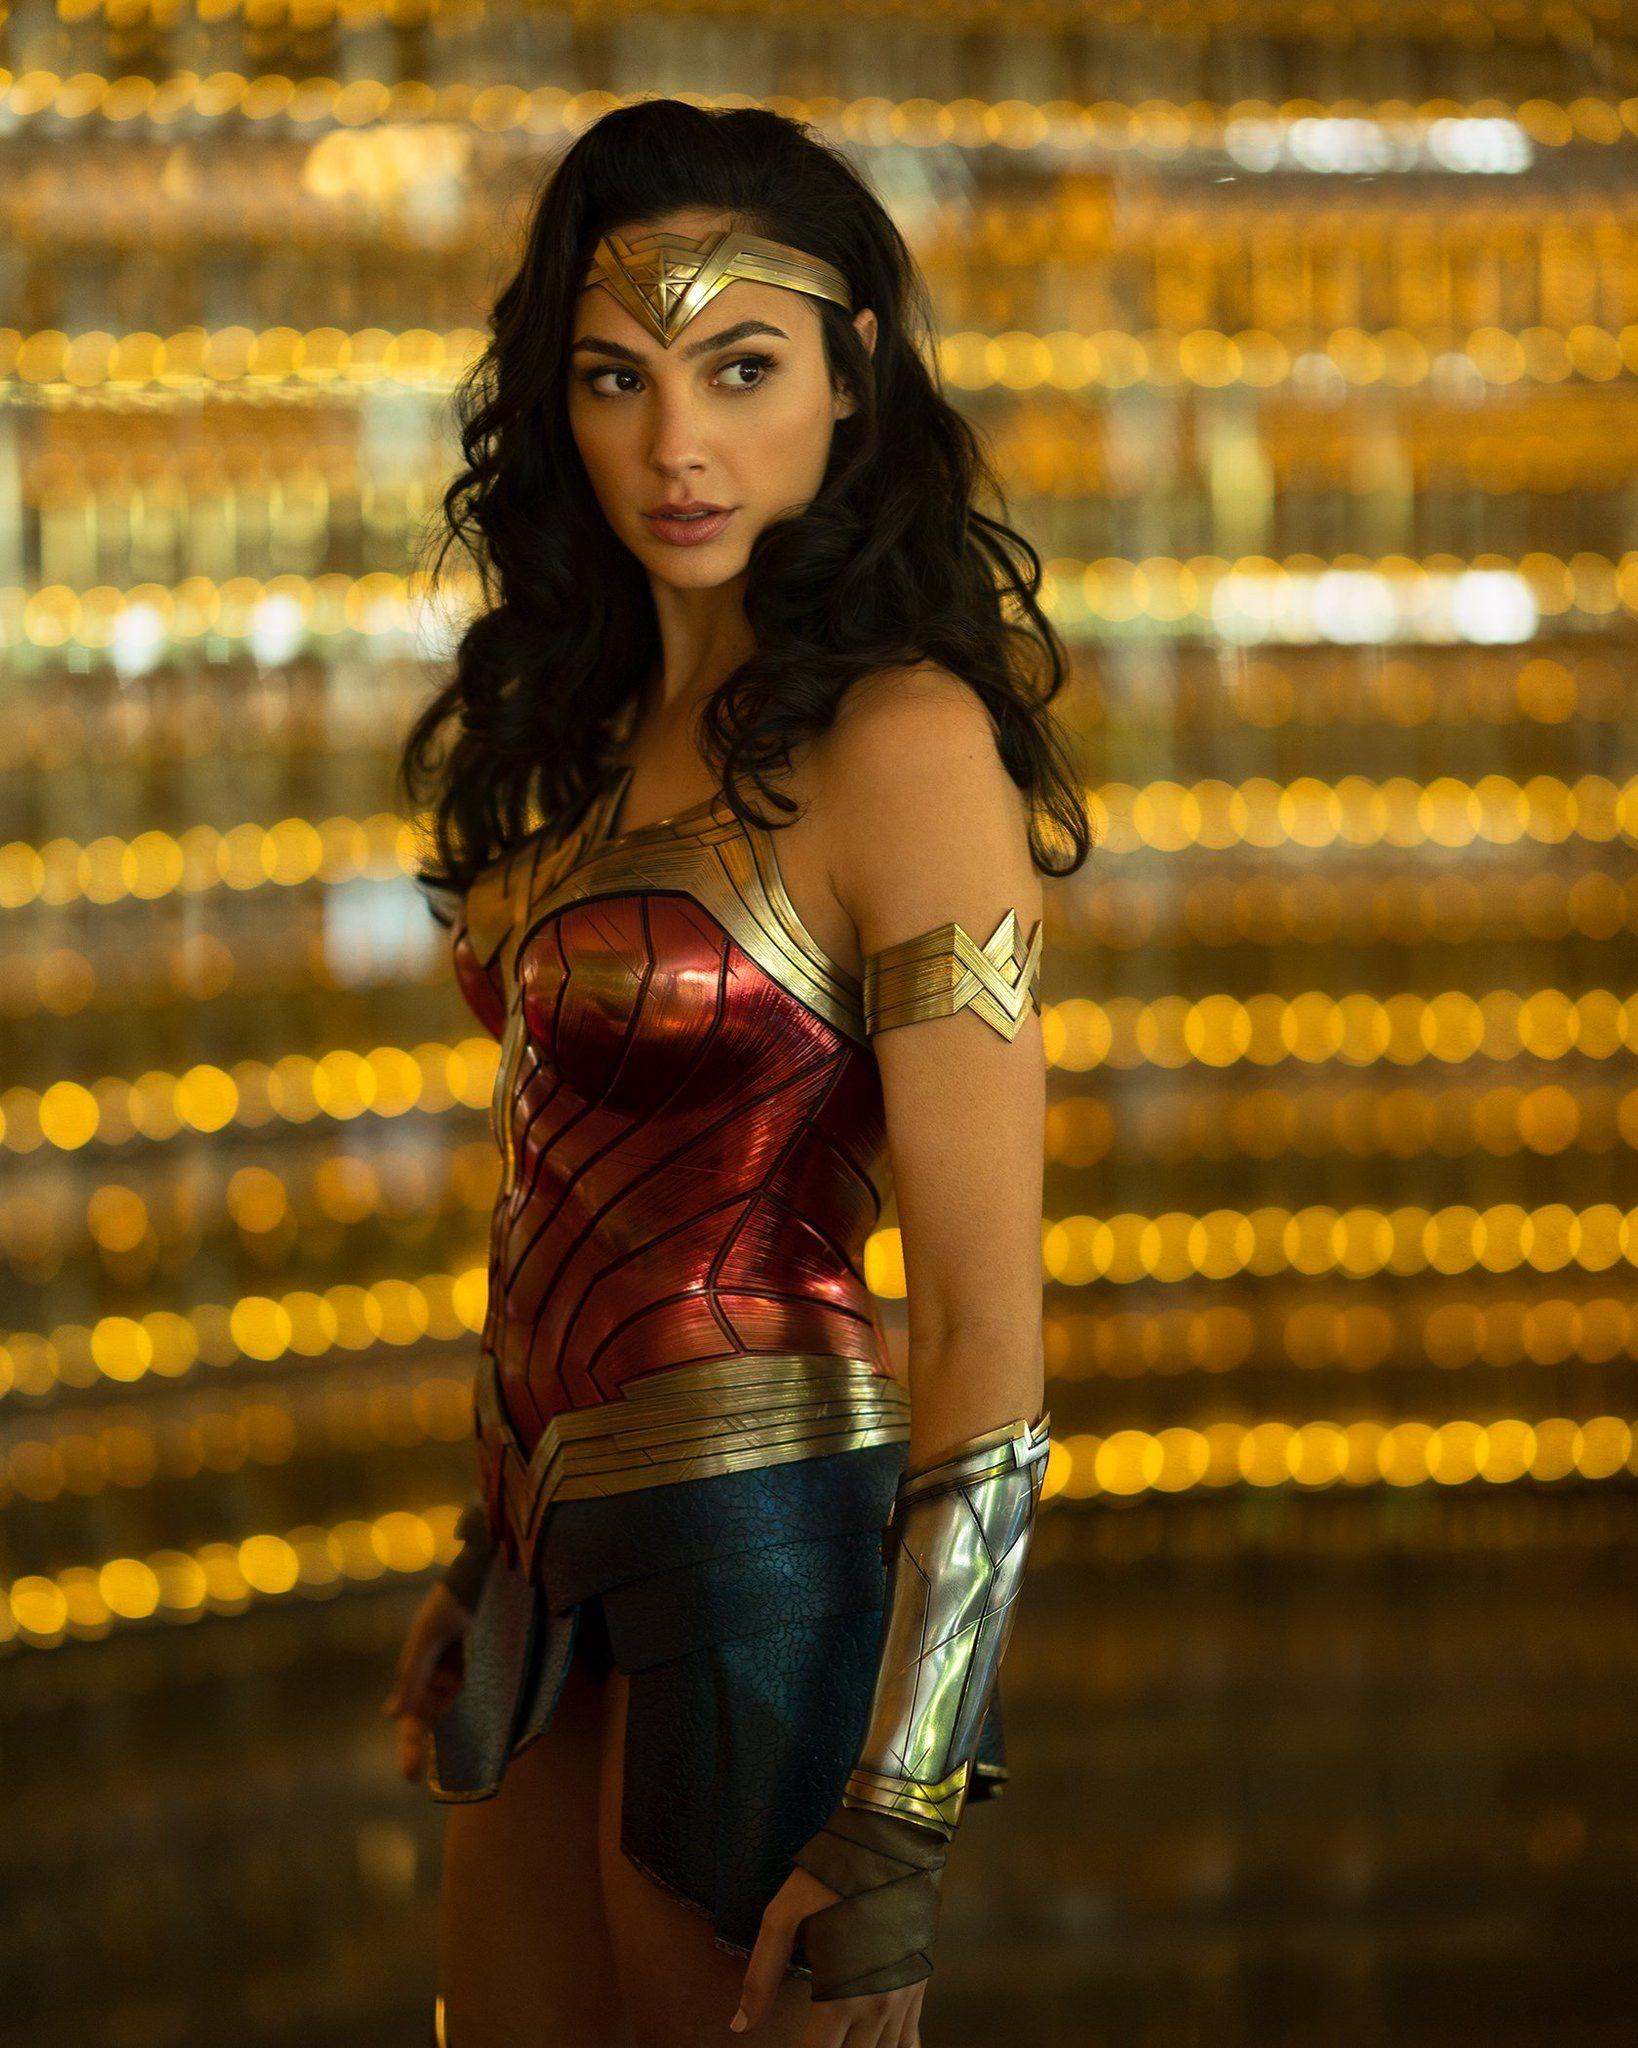 Wonder Woman 1984 2019 Gal Gadot Wonder Woman Wonder Woman Movie Wonder Woman